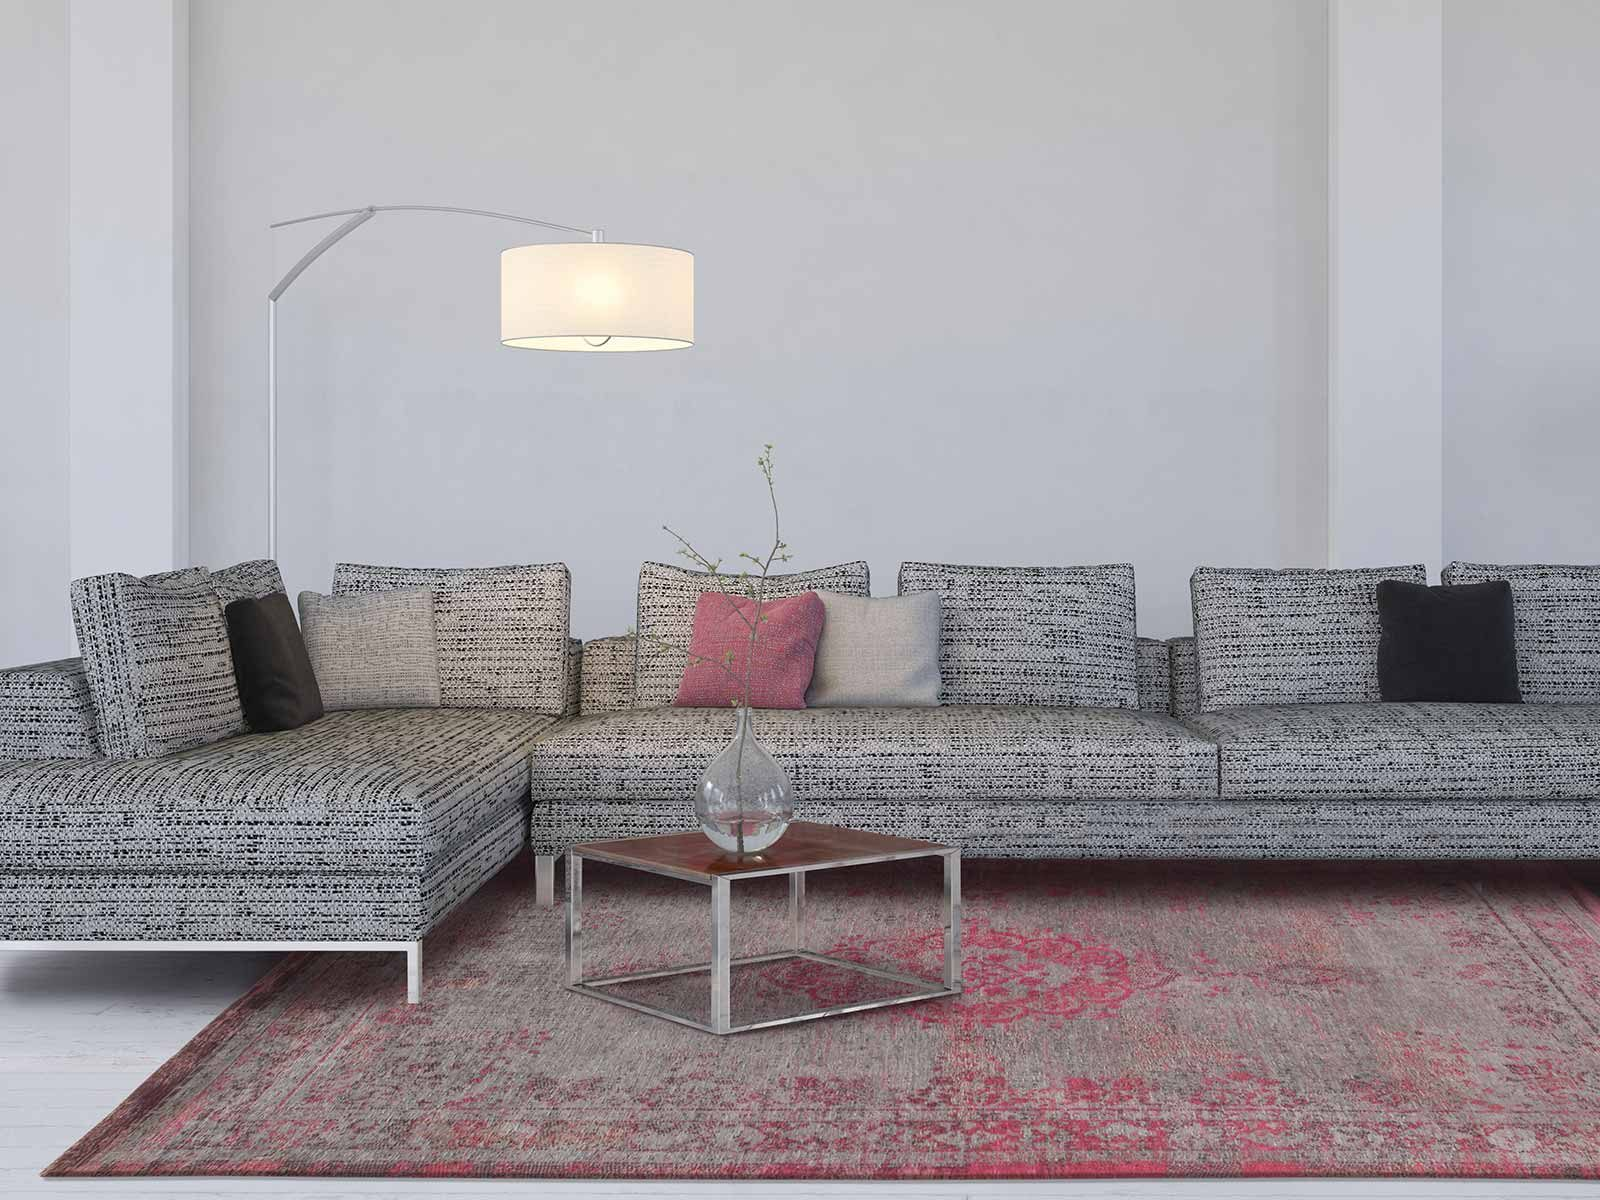 tapijt Louis De Poortere LX8261 Fading World Medaillon Pink Flash interior